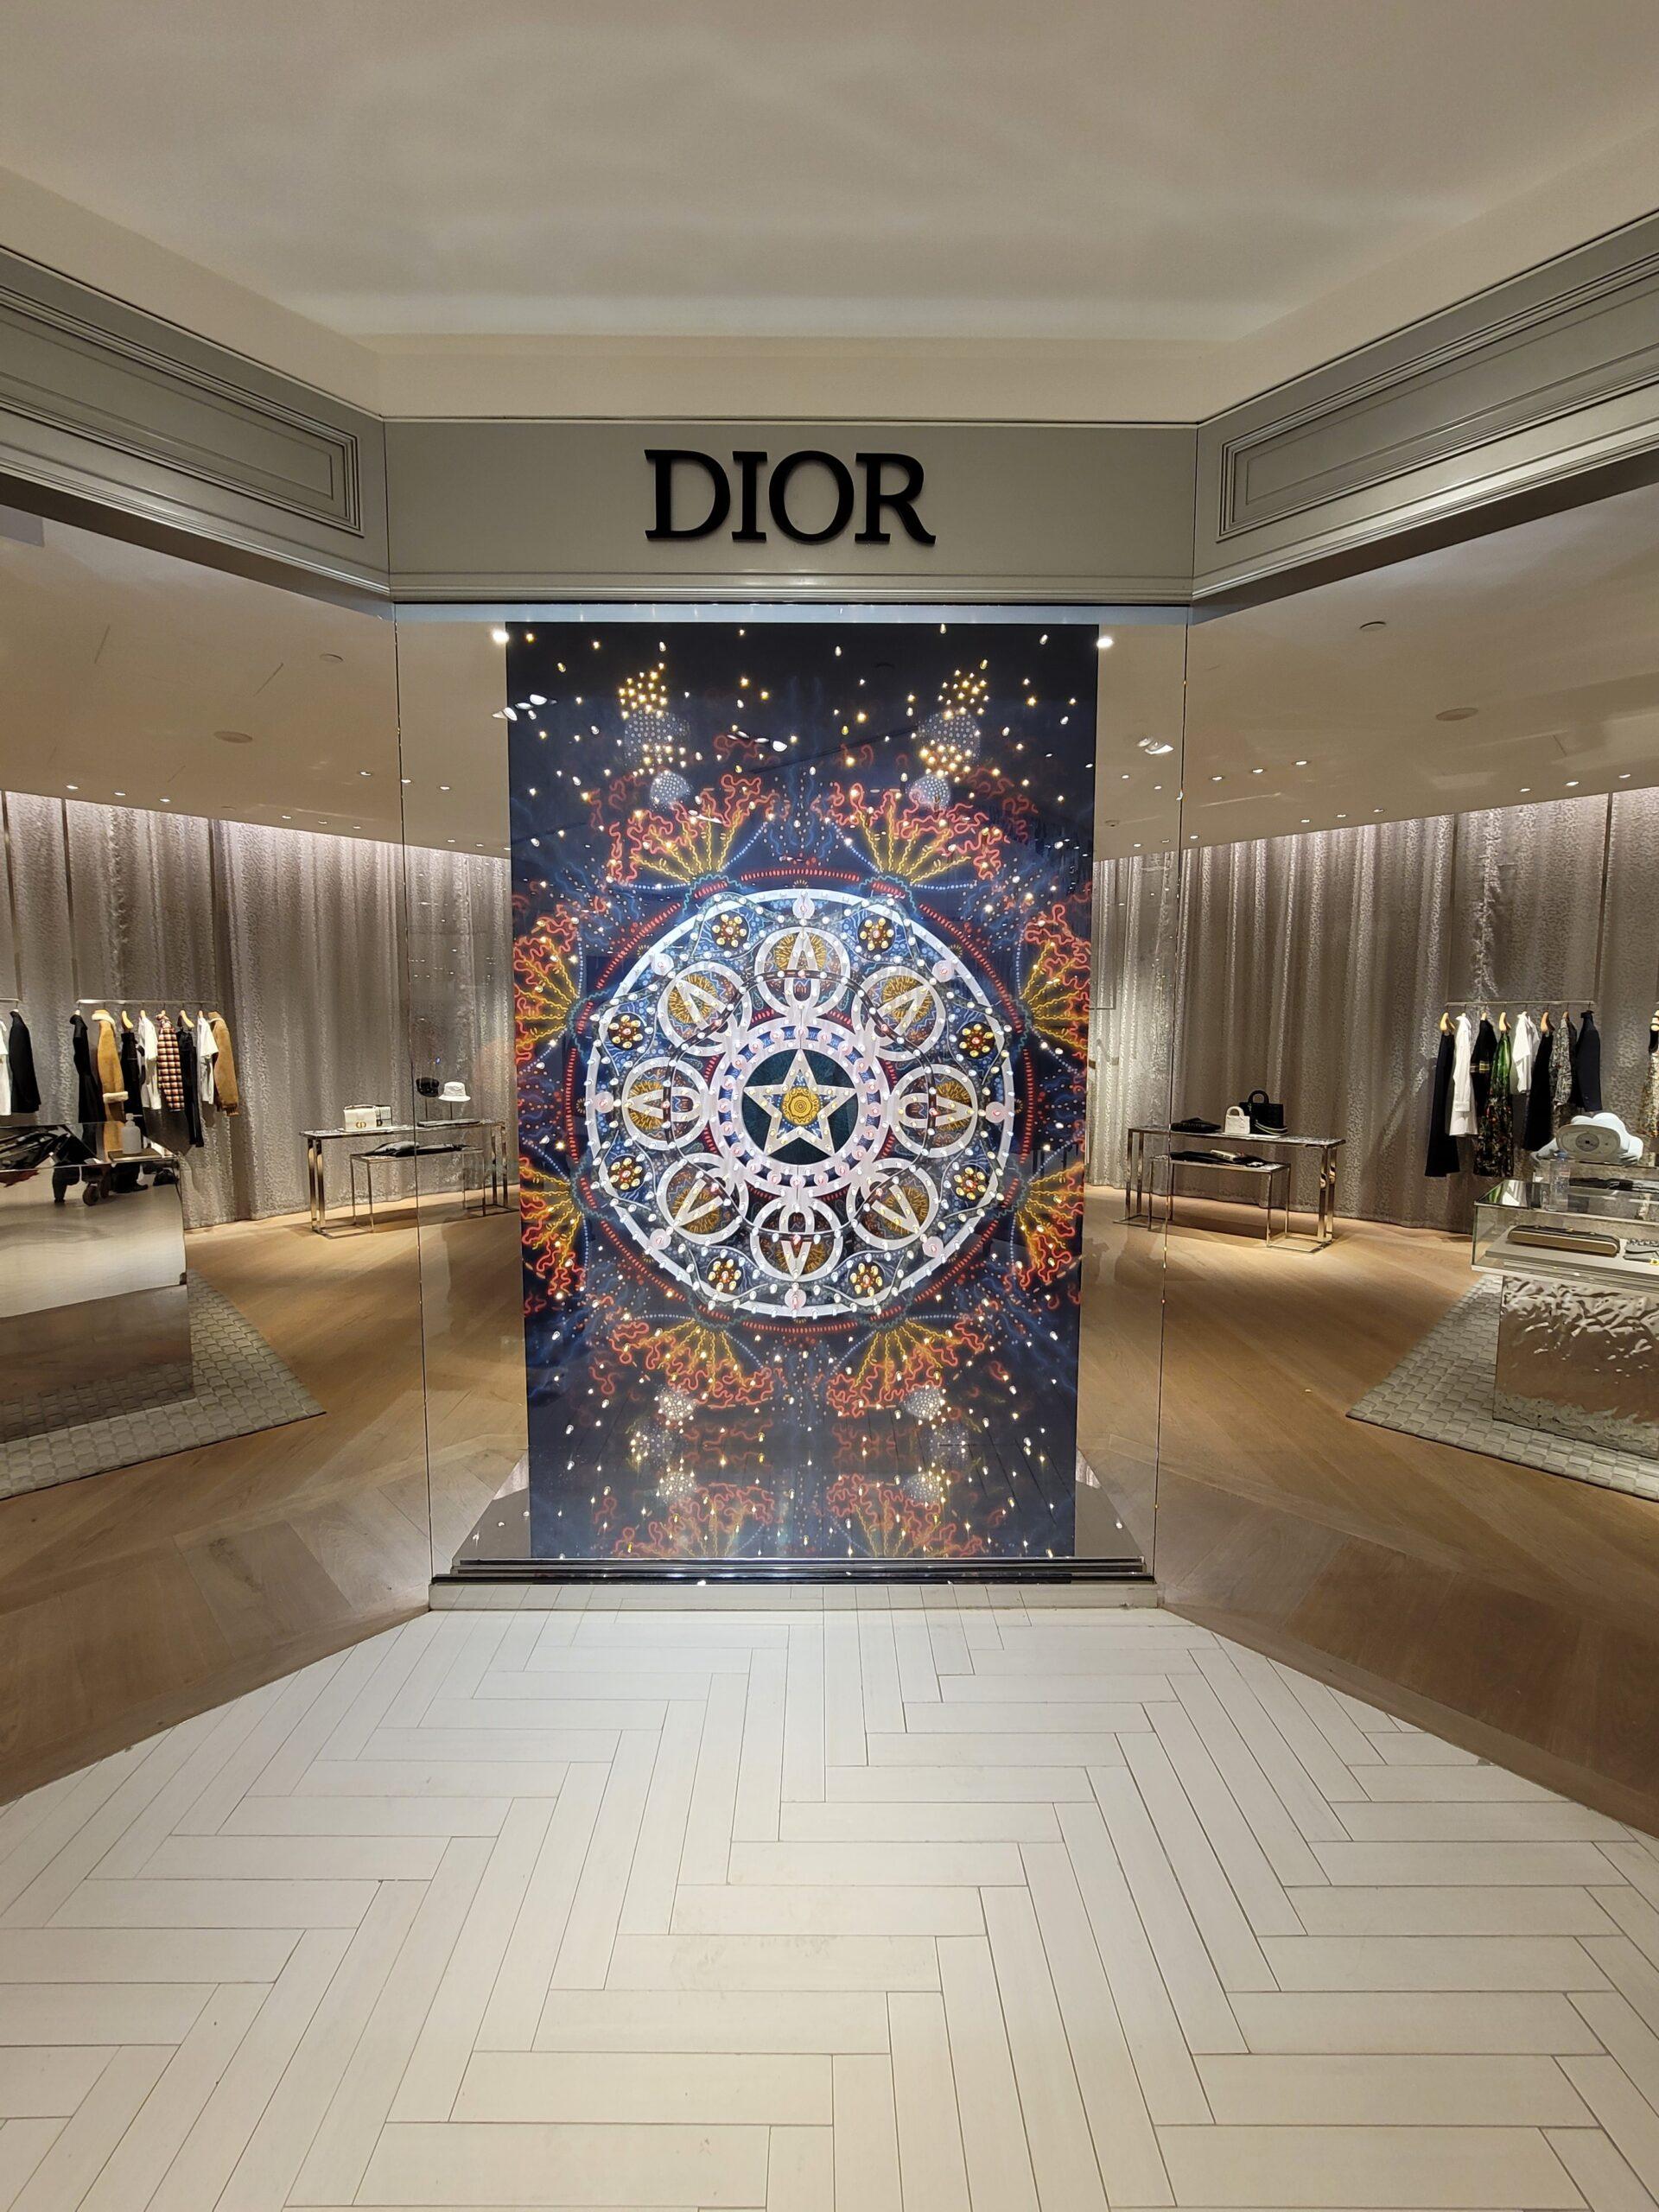 Christian Dior – Saks Fifth Avenue Second Floor – Sherway Gardens Toronto